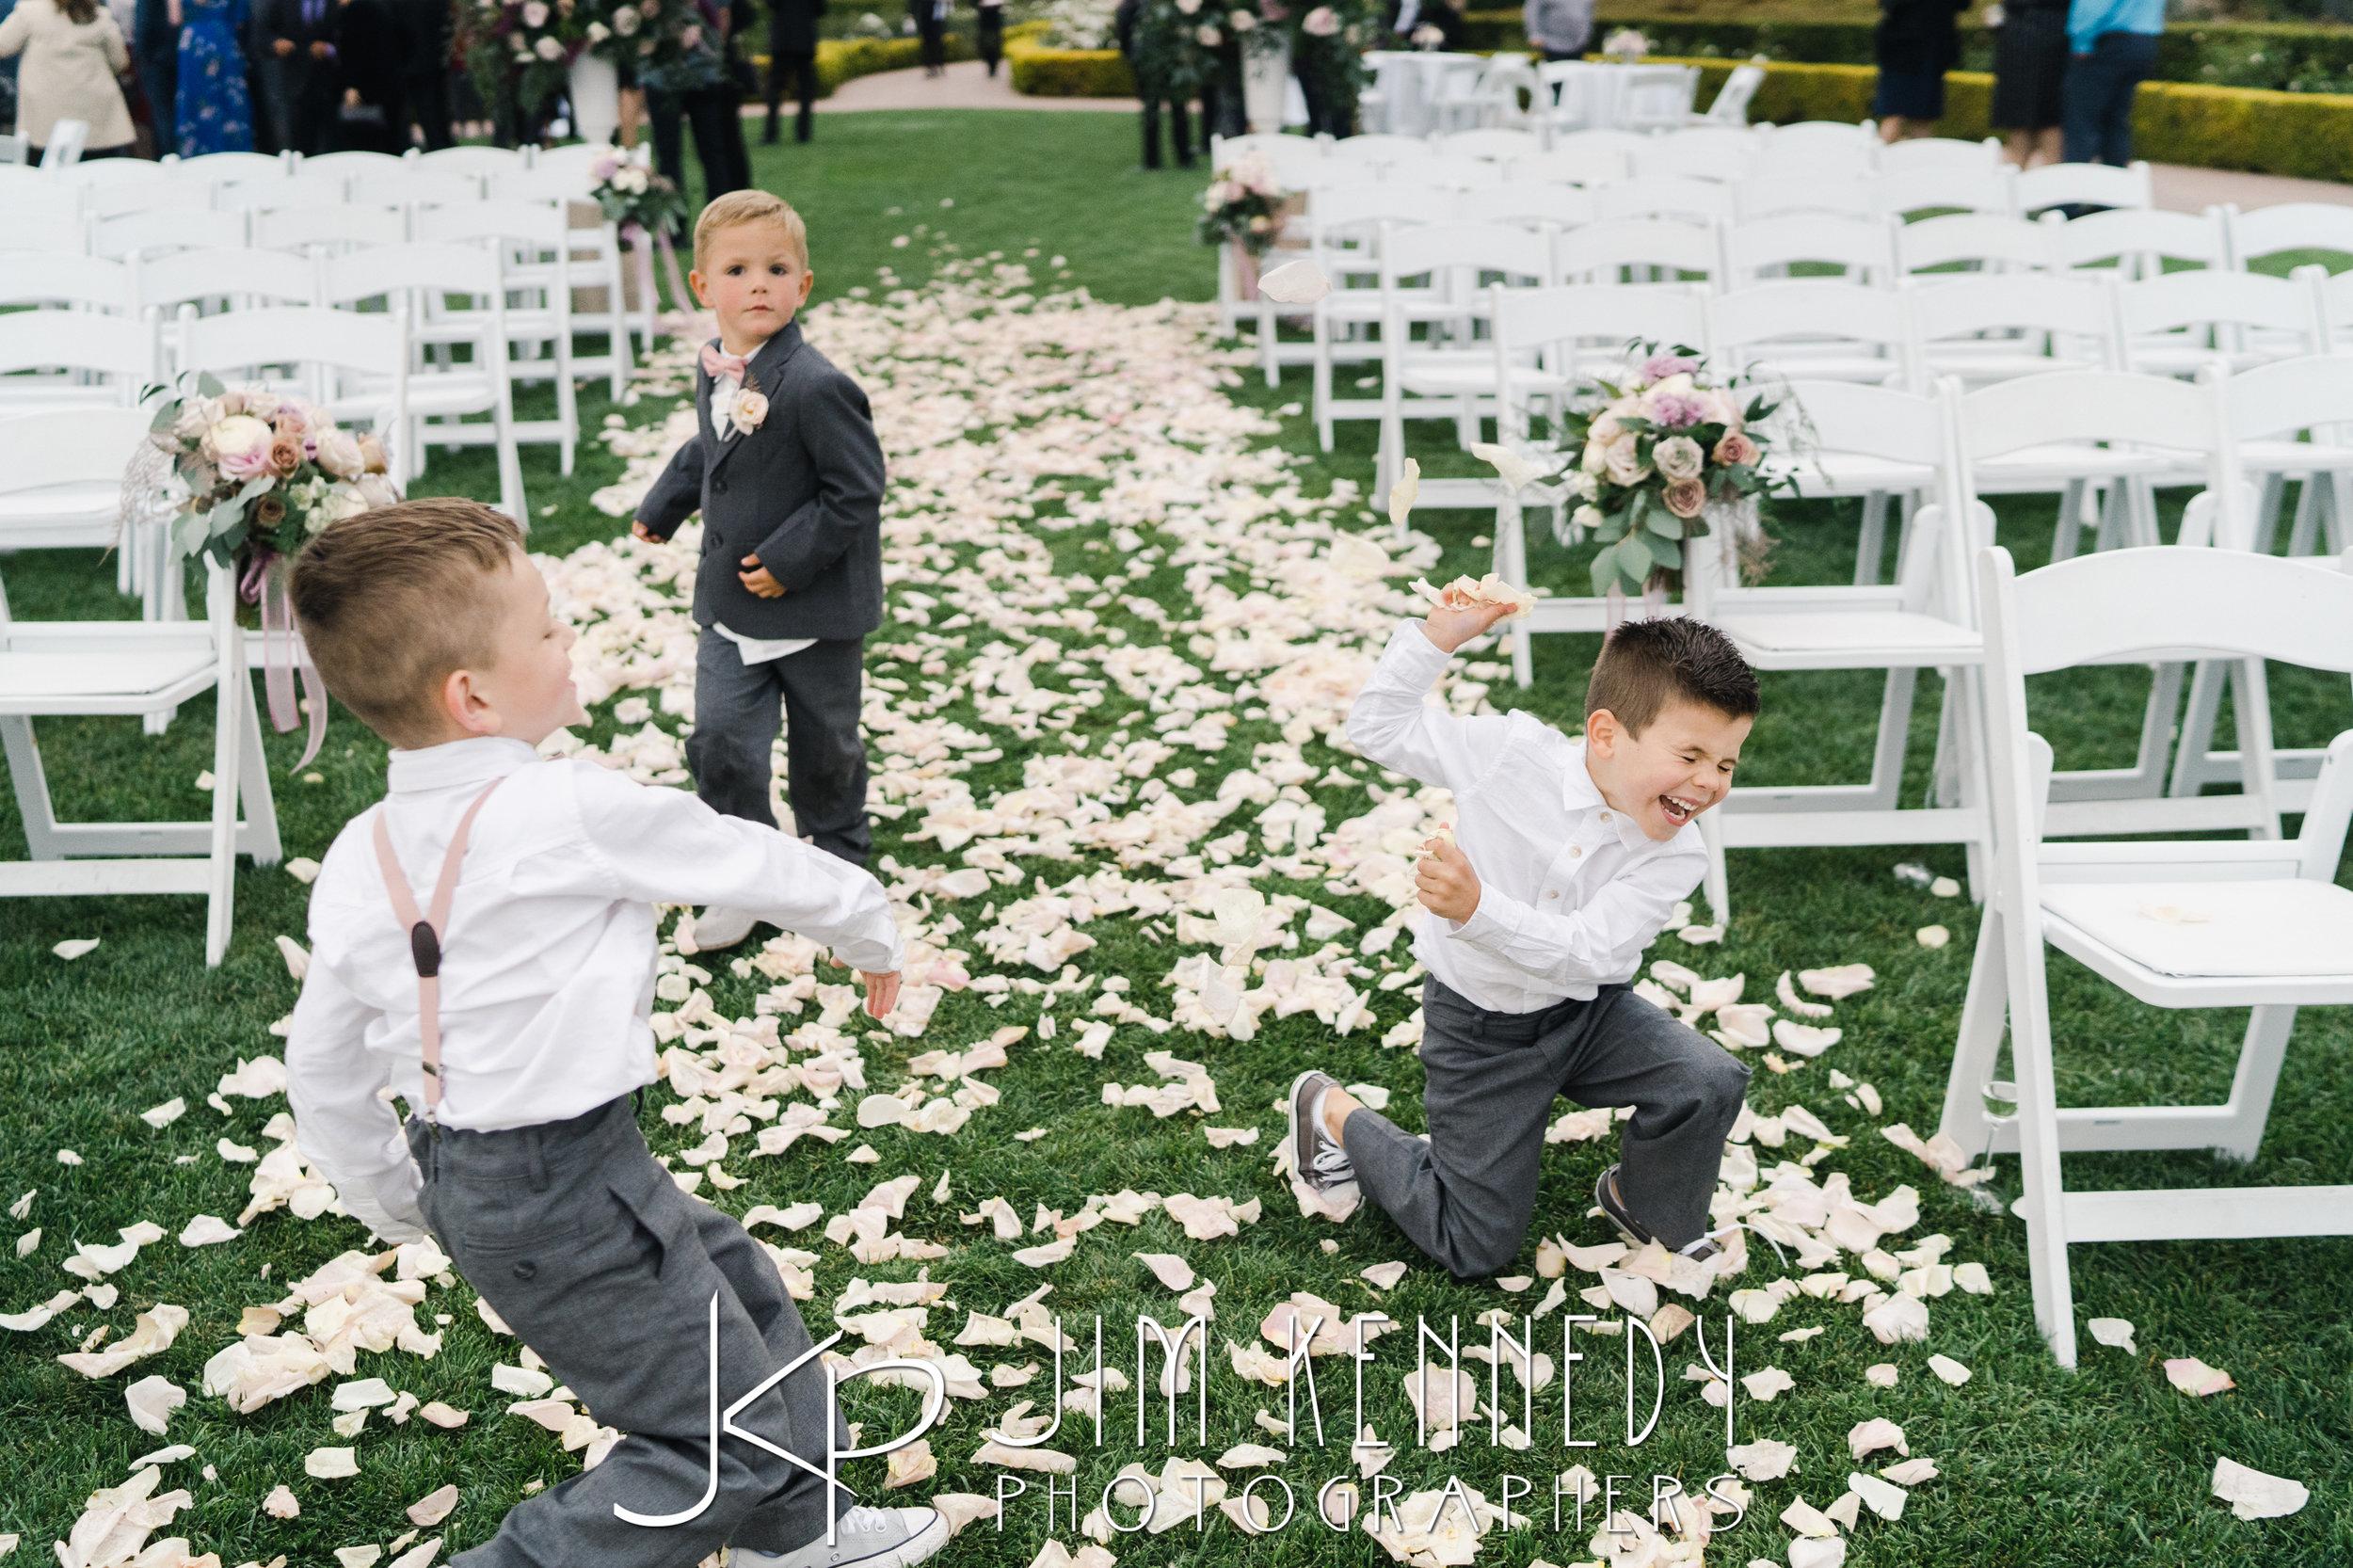 pelican-hill-wedding-jim-kenedy-photographers_0138.JPG